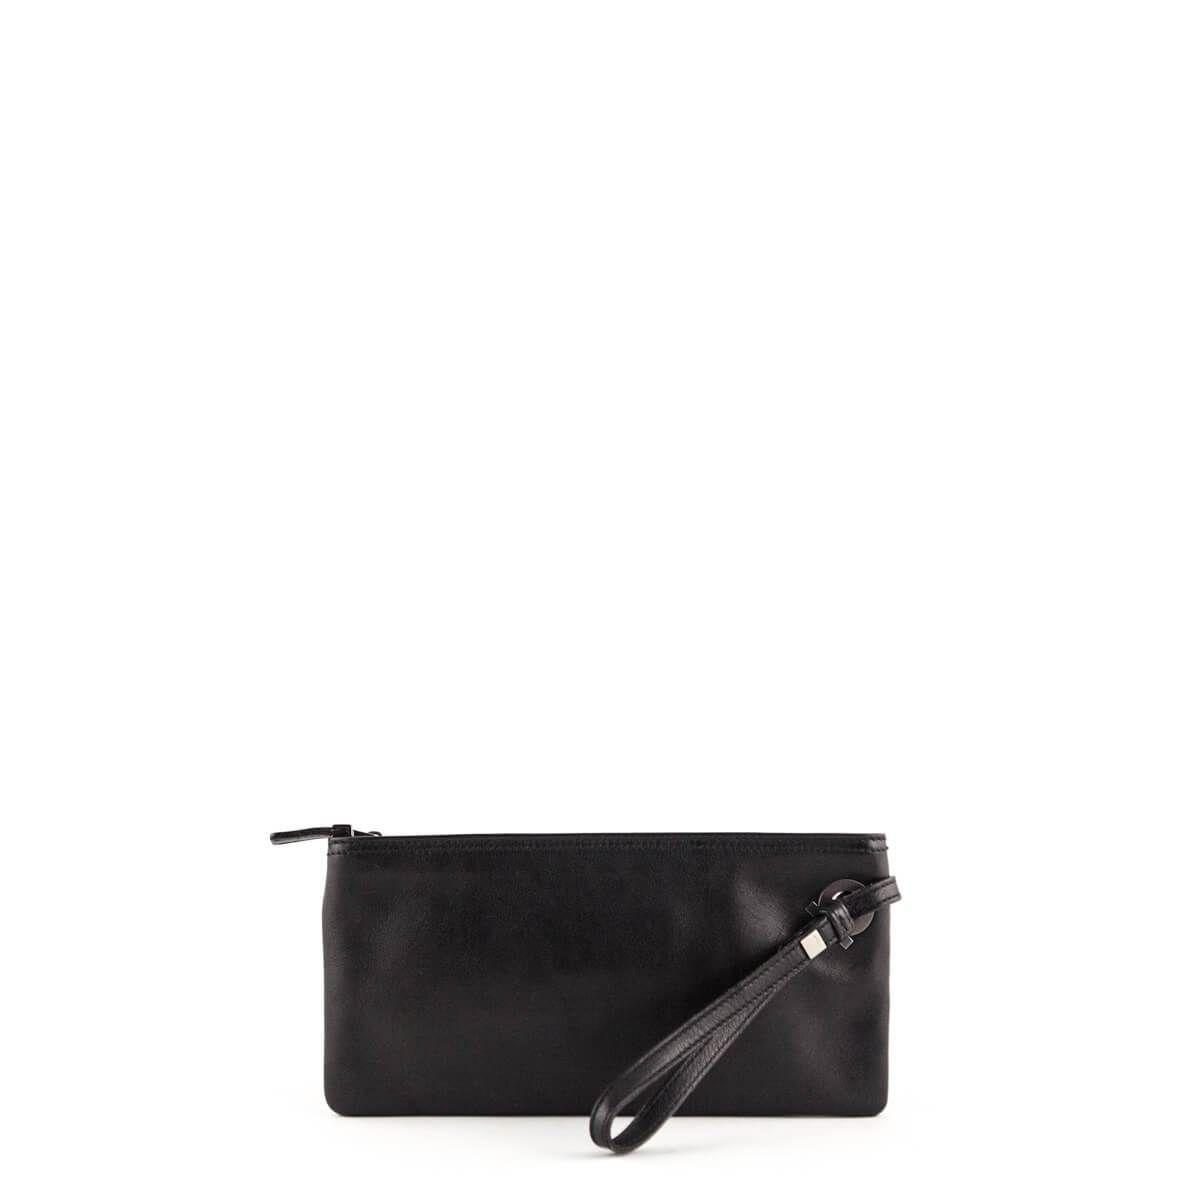 Salvatore Ferragamo Black Leather Wristlet Clutch Lovethatbag